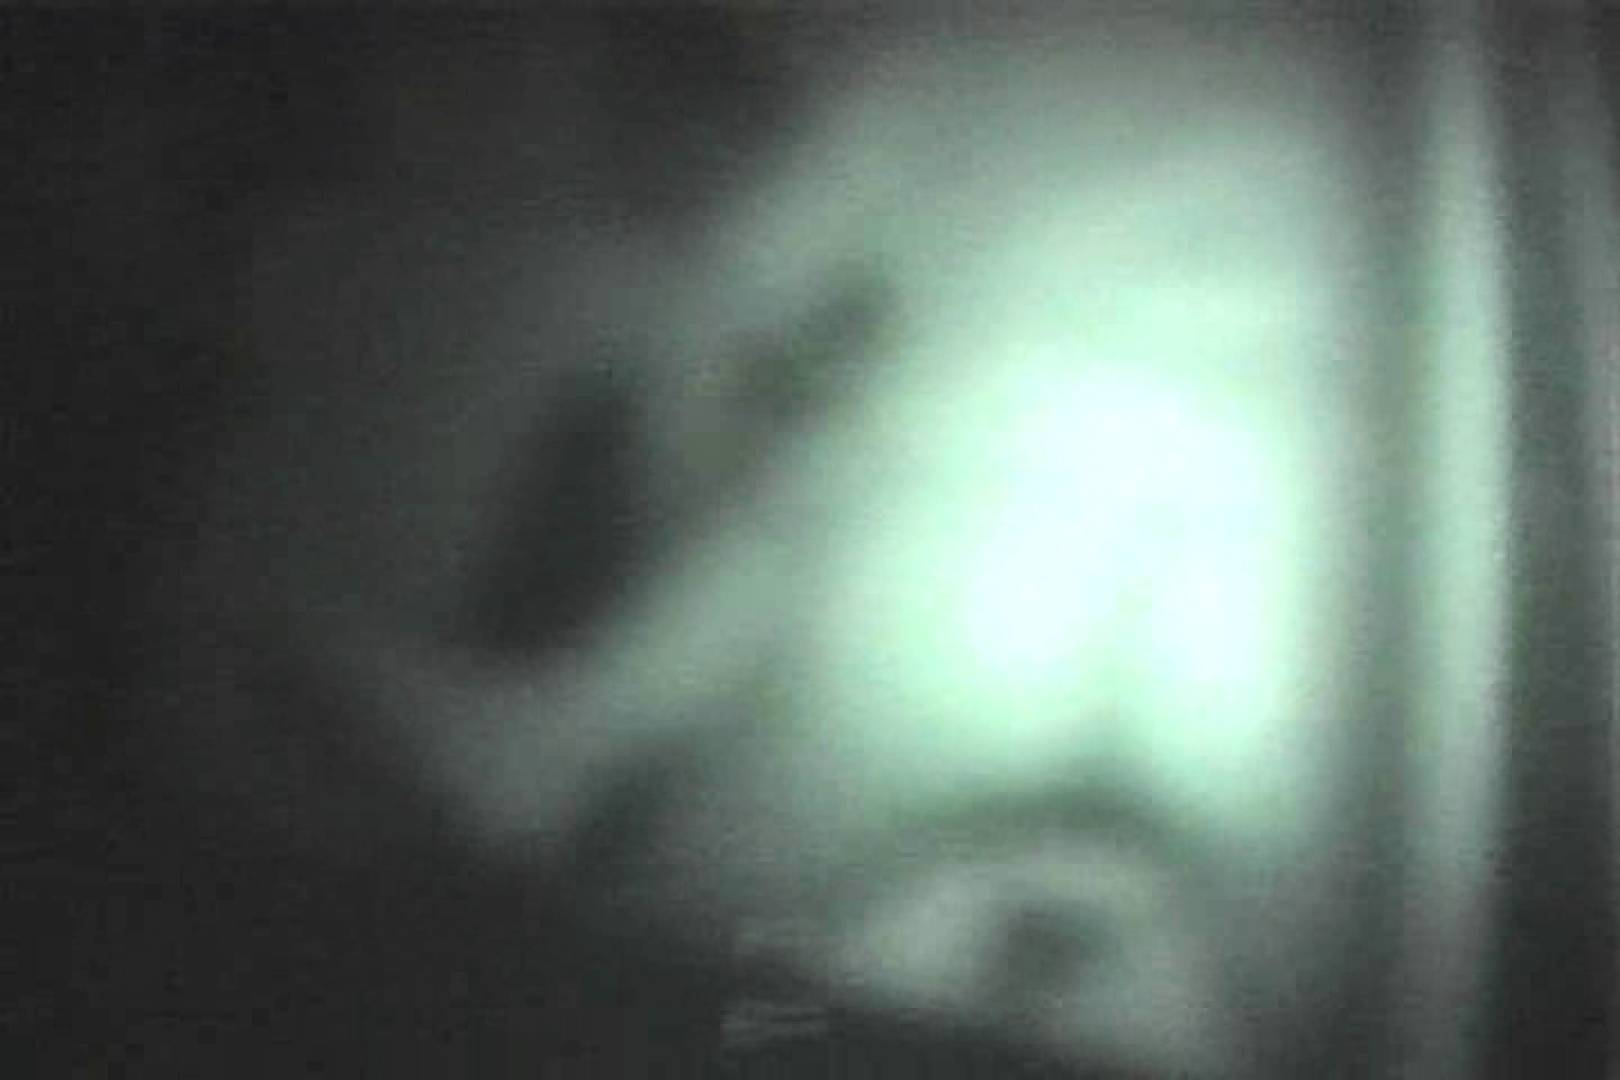 MASAさんの待ち伏せ撮り! 赤外線カーセックスVol.3 盗撮 ワレメ動画紹介 71pic 38